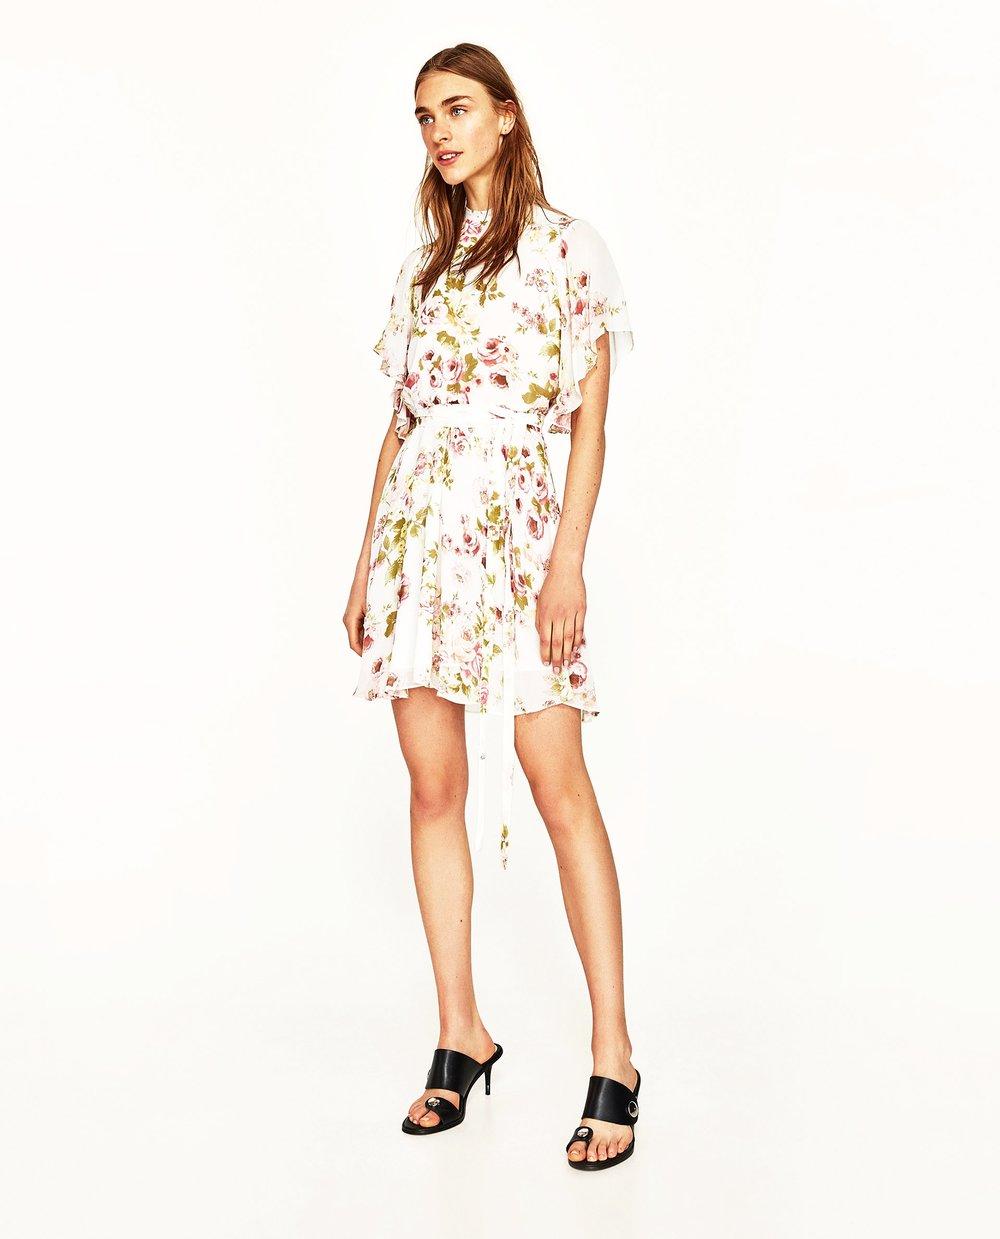 Zara Printed Mini Dress with Belt